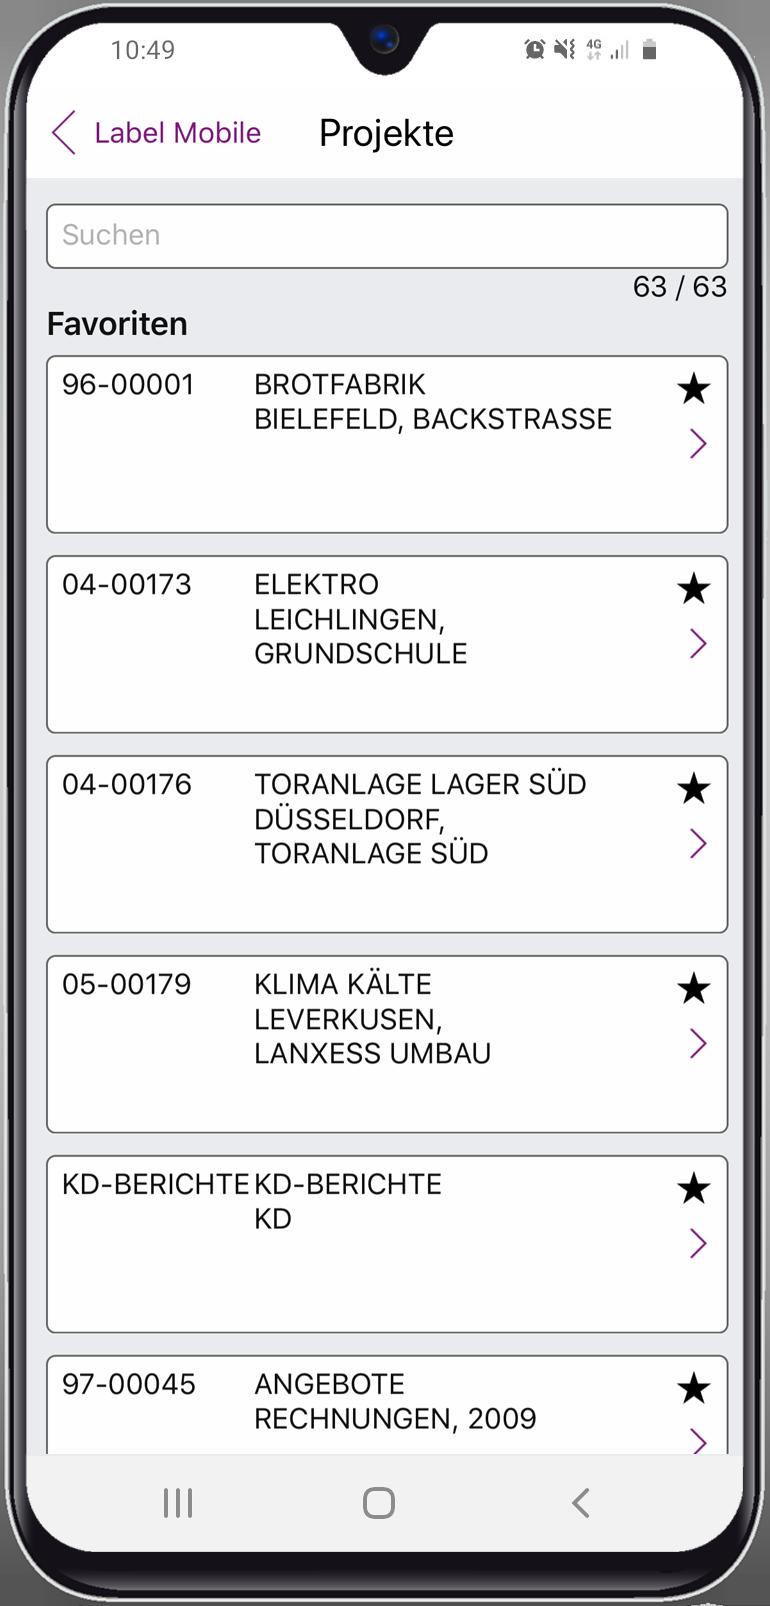 Label Mobile: Projektabwicklung